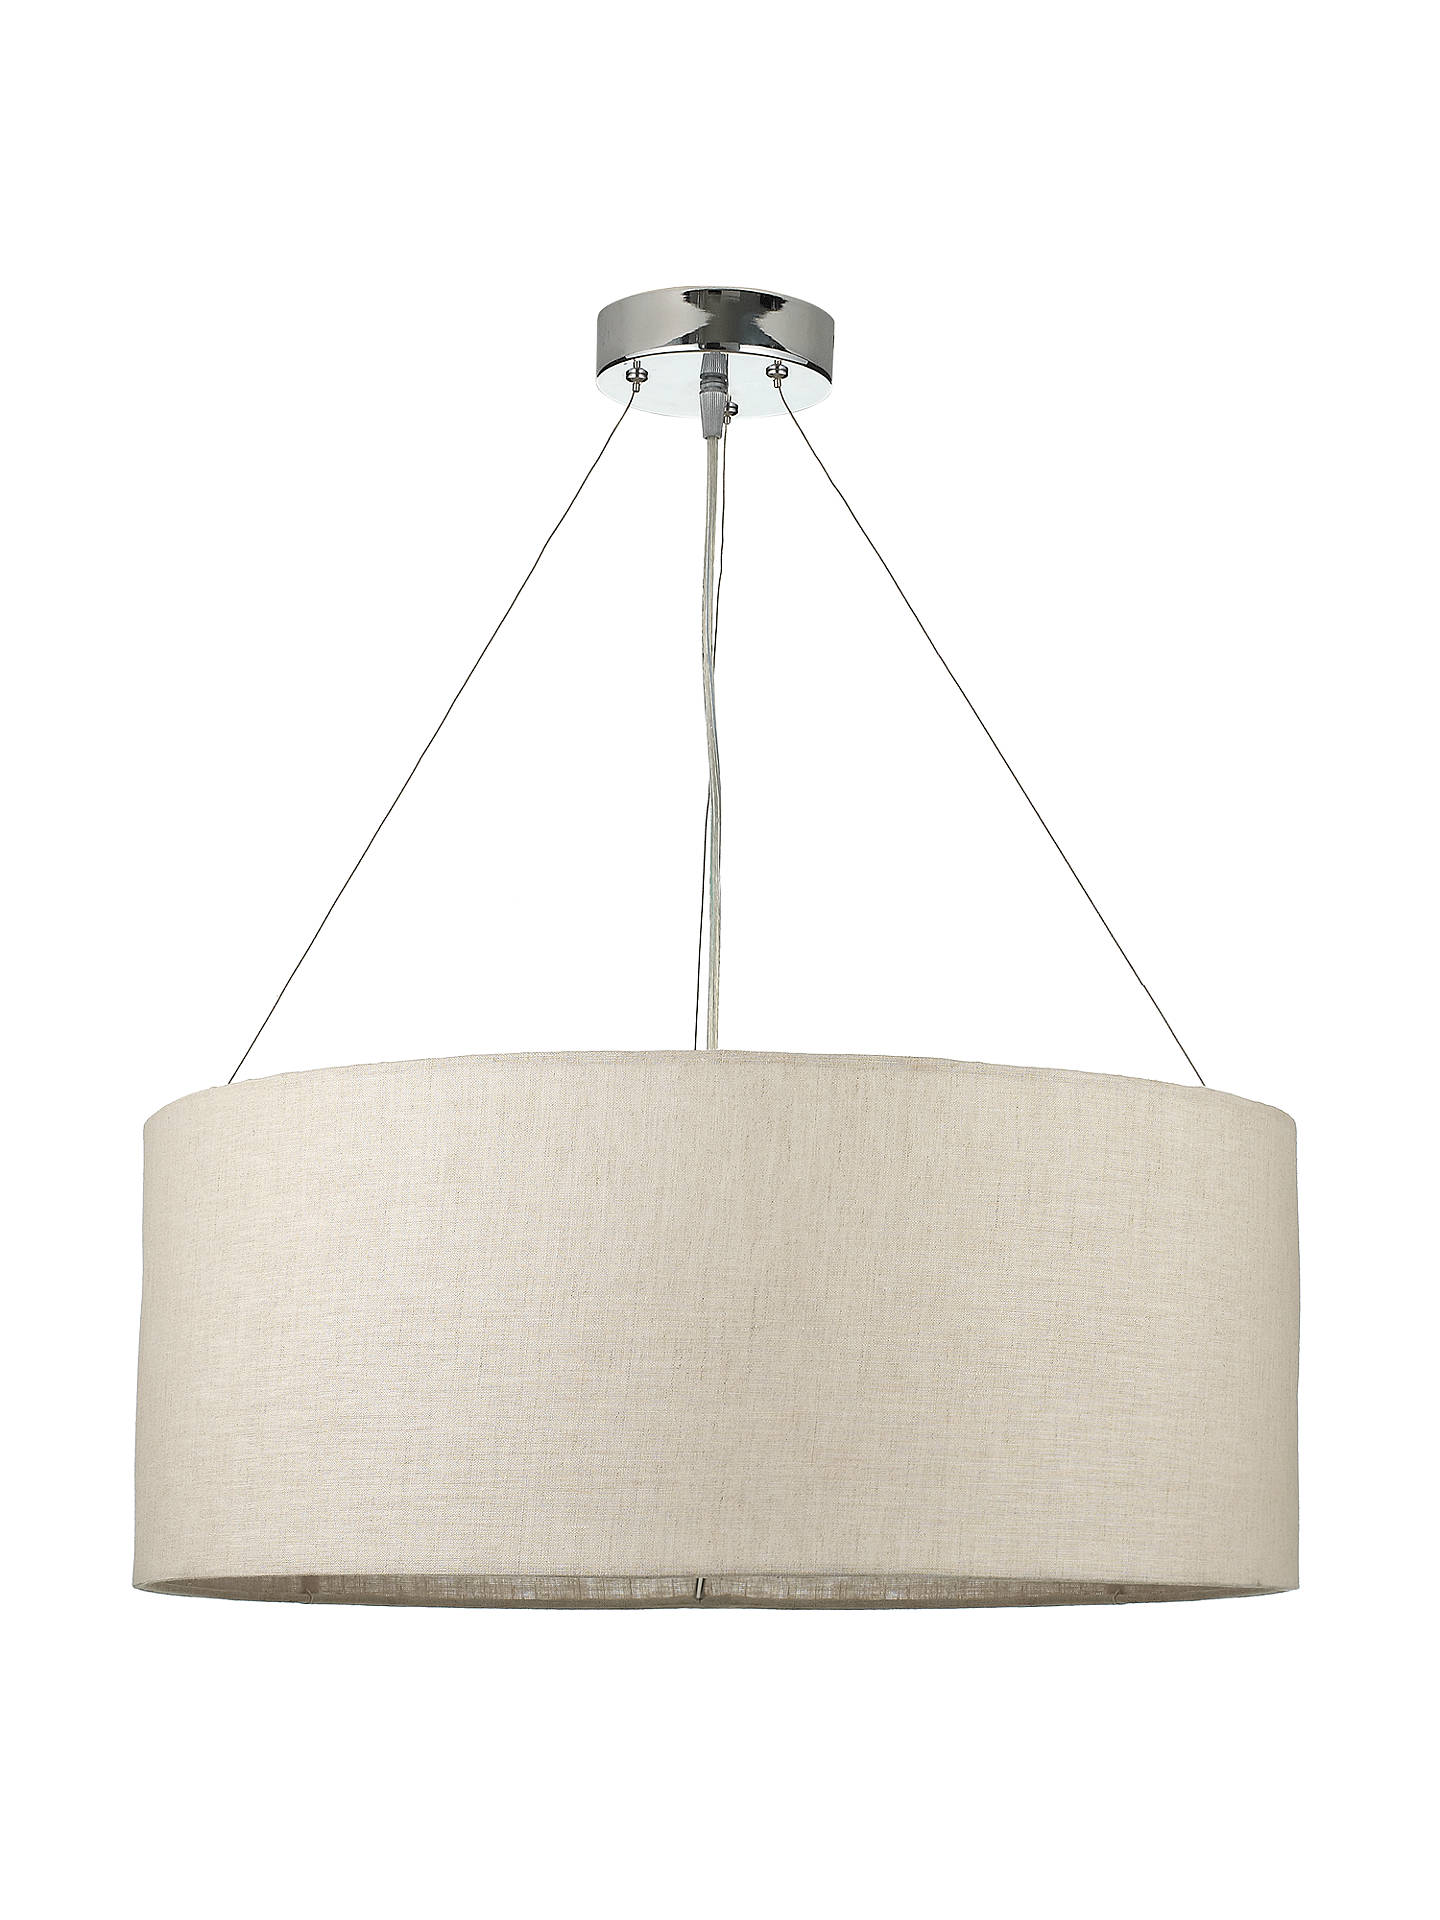 Buy john lewis partners samantha linen ceiling light online at johnlewis